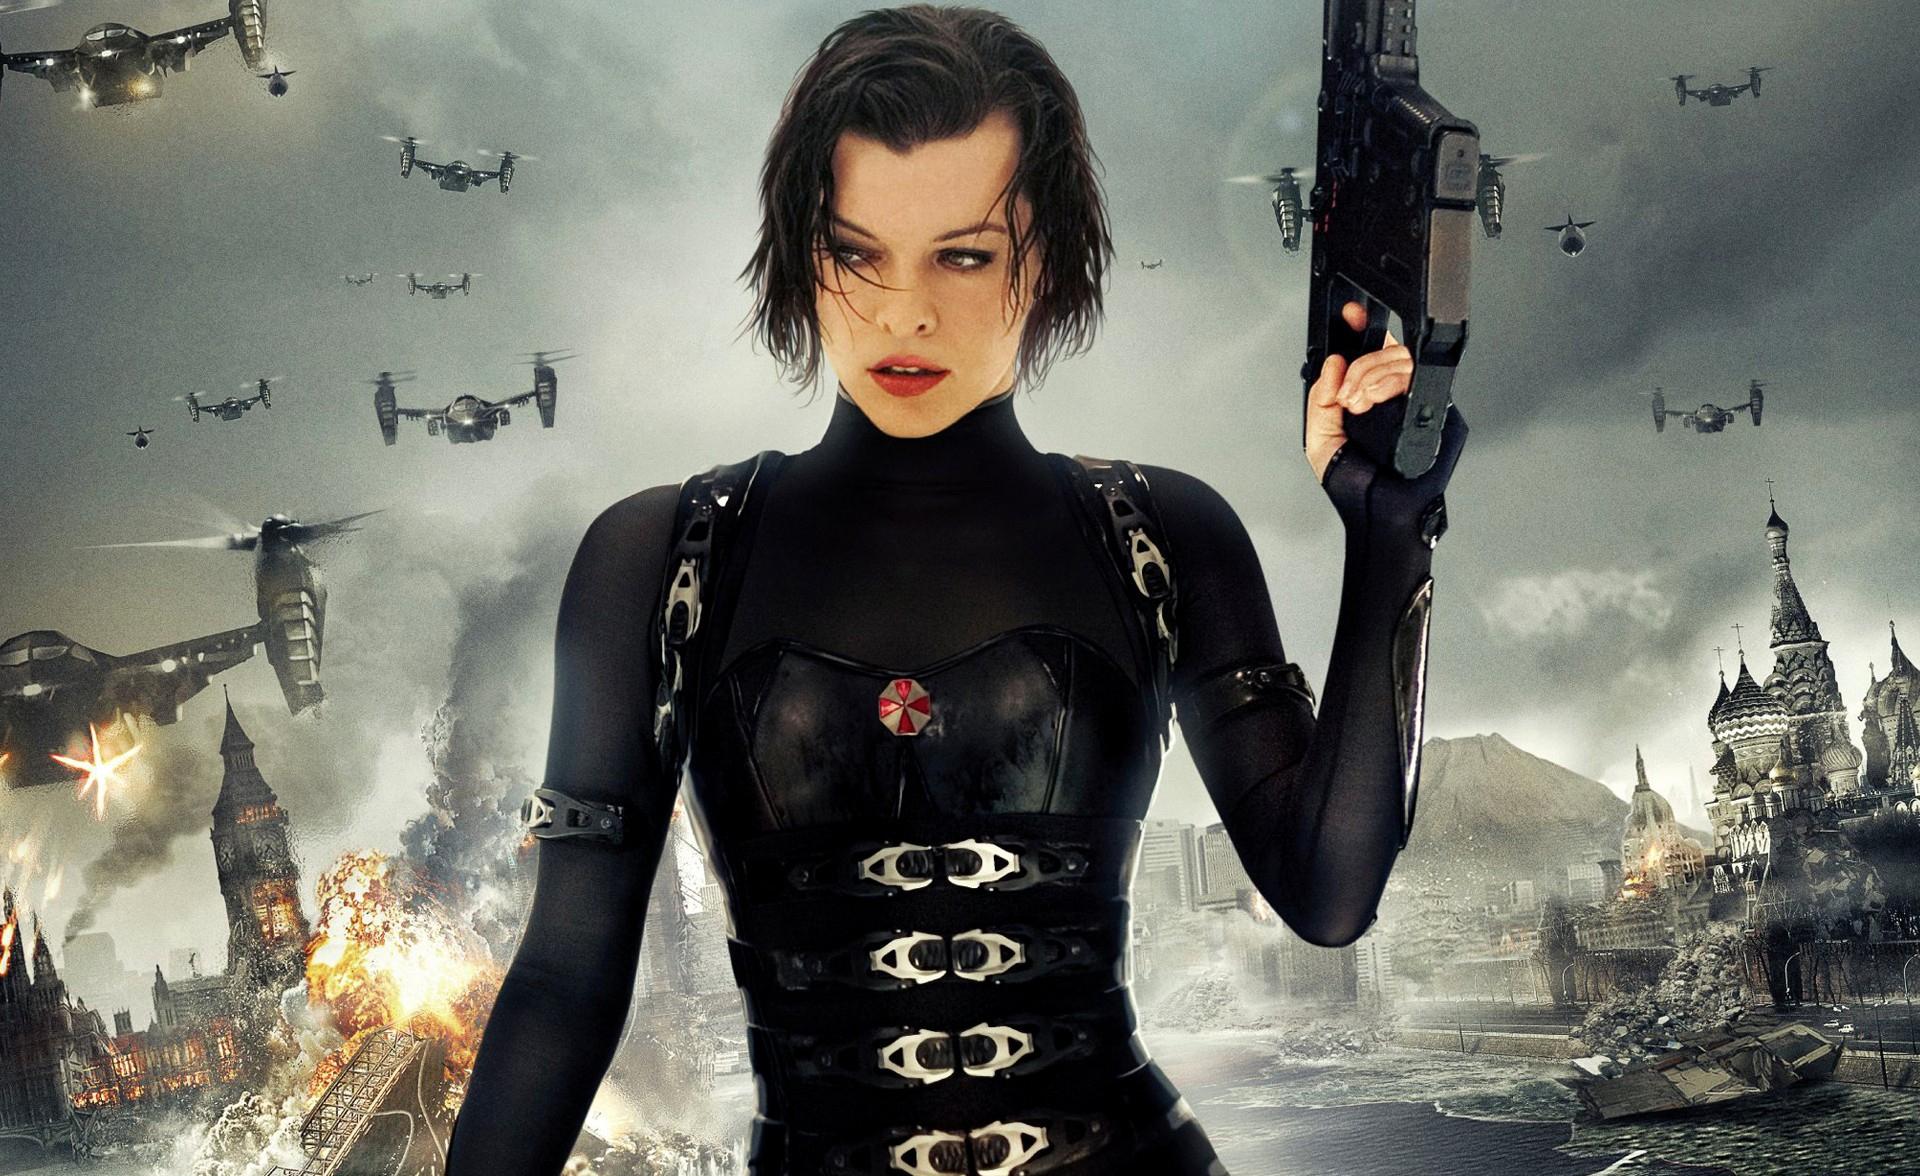 Recident evil girl fucking image pornos picture